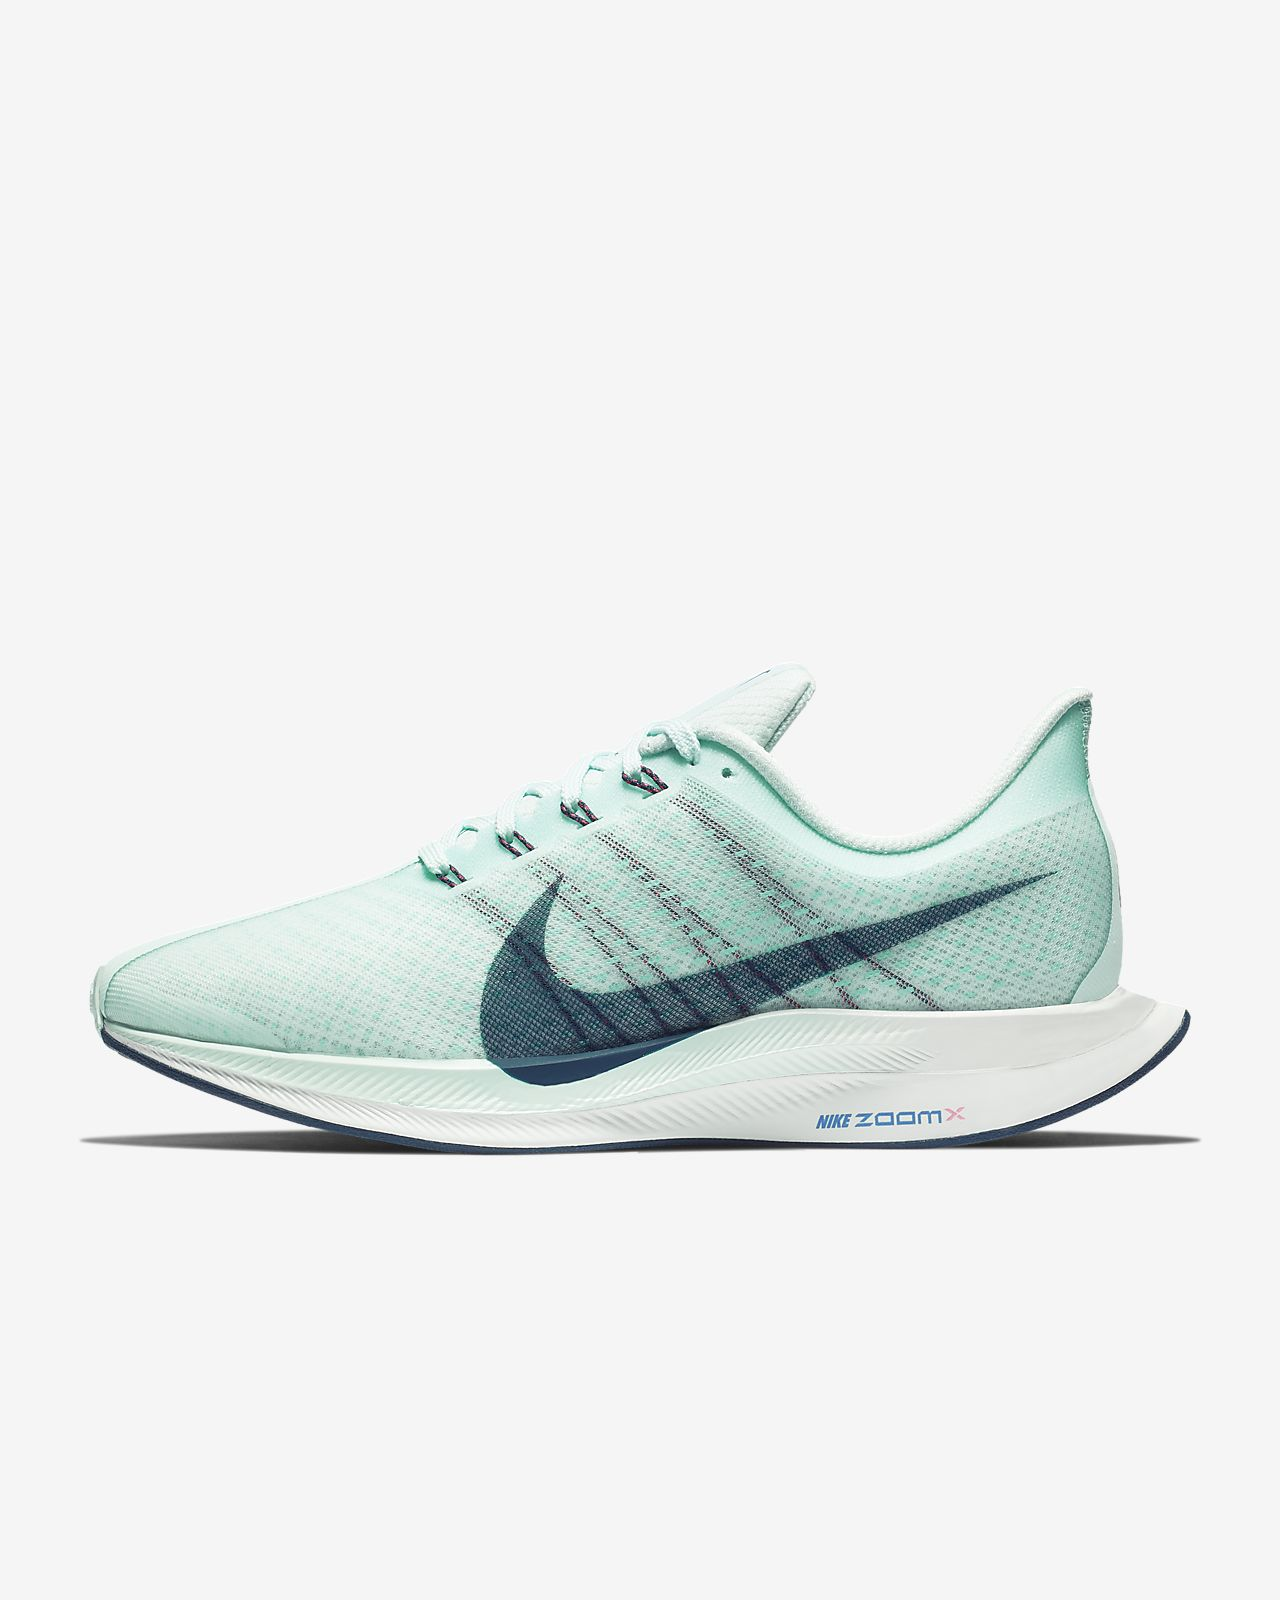 1cc4ddd0a4c6 Nike Zoom Pegasus Turbo Women s Running Shoe. Nike.com HU